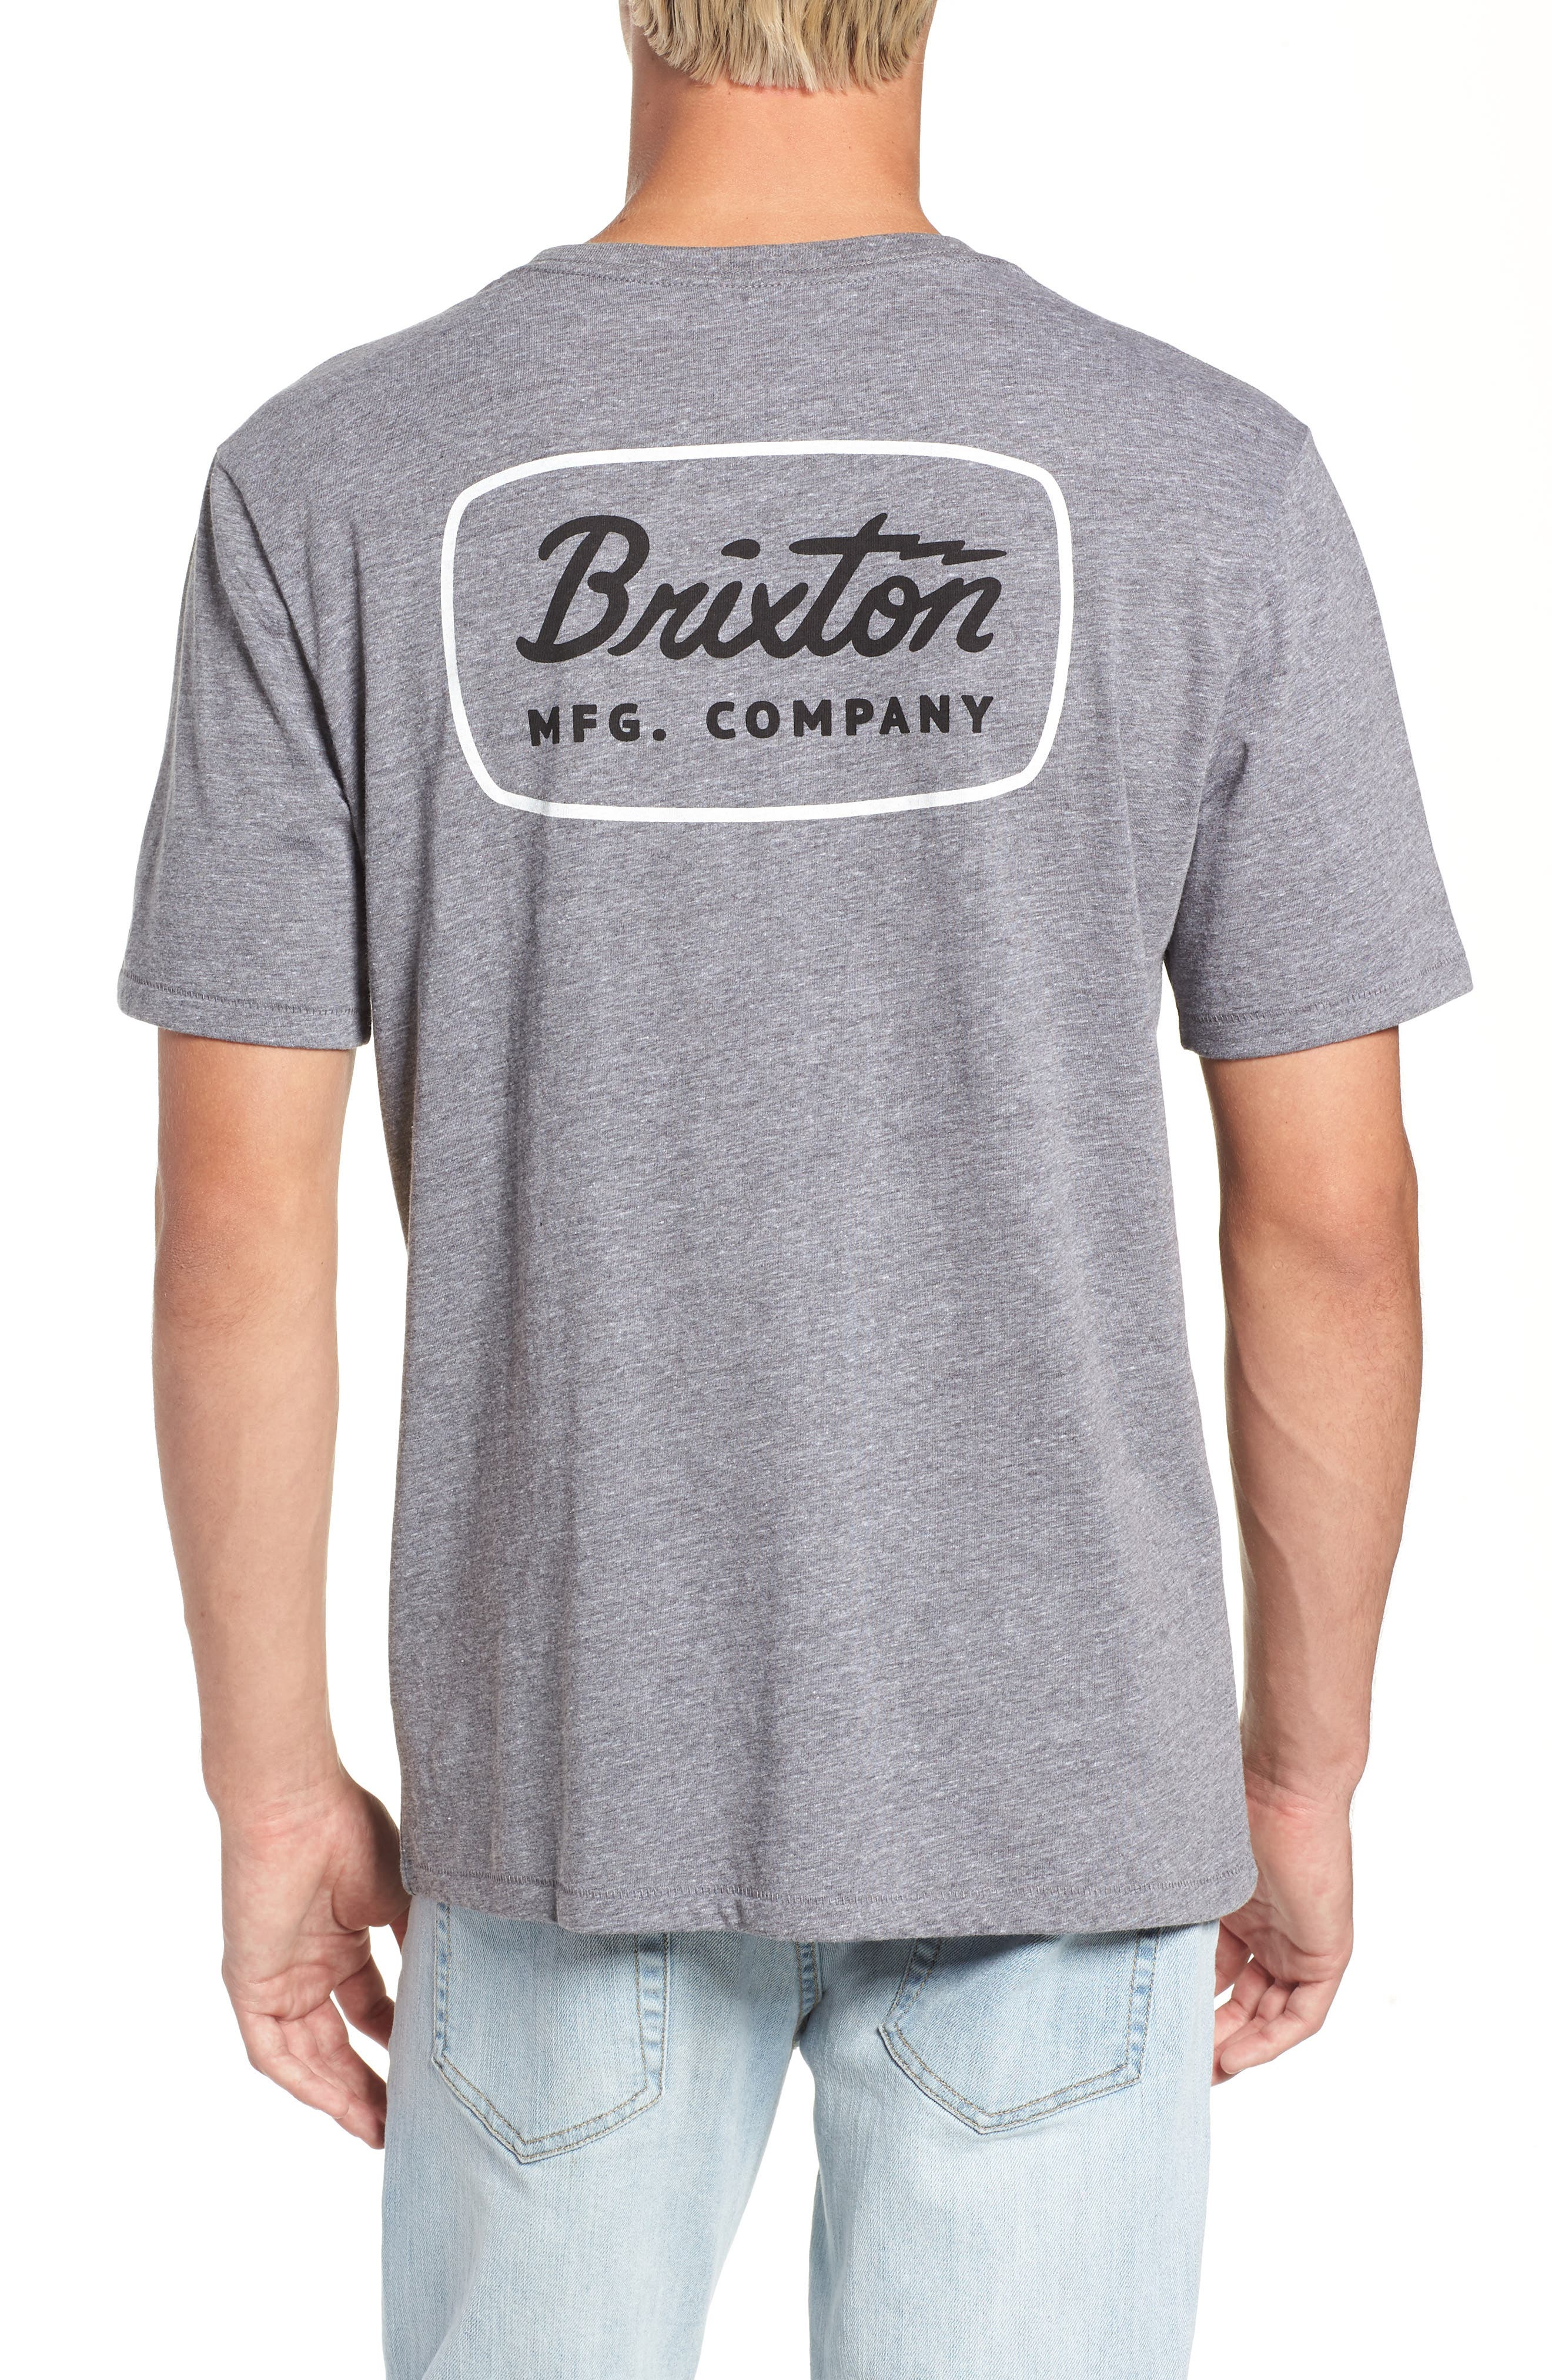 Jolt T-Shirt,                             Alternate thumbnail 2, color,                             HEATHER GREY/ WHITE